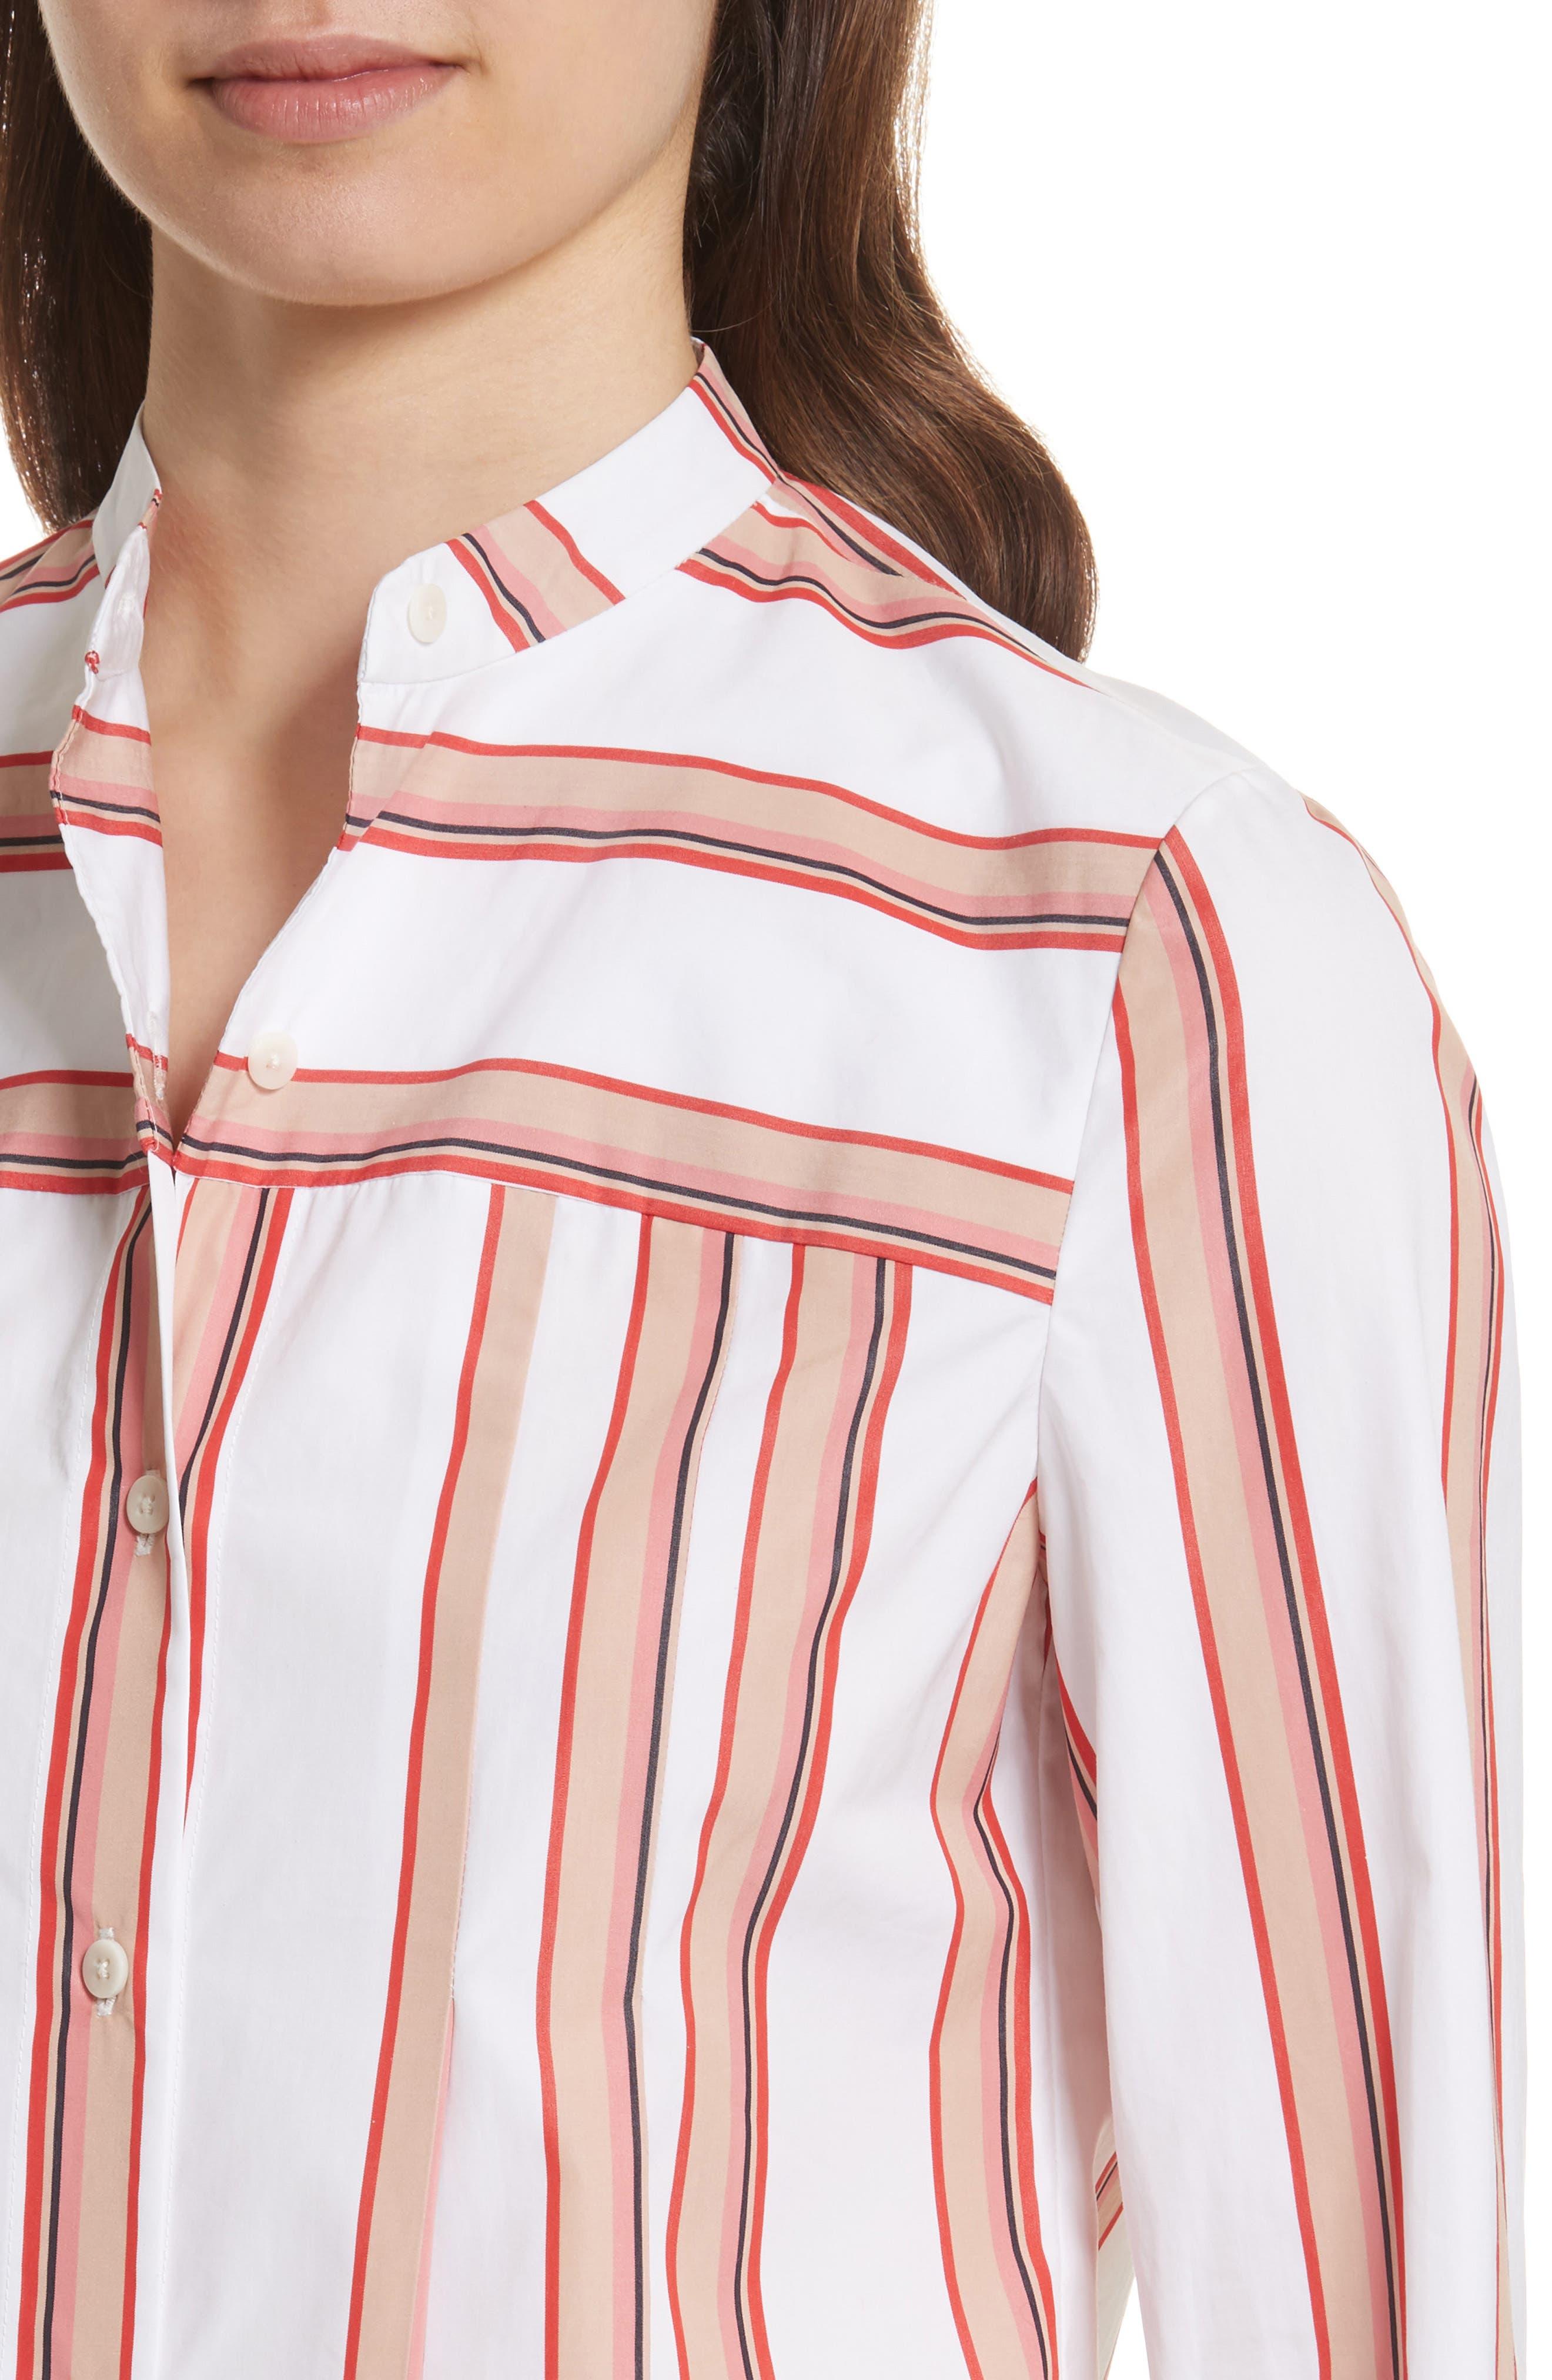 Diane von Furstenberg Stripe Shirt,                             Alternate thumbnail 4, color,                             107